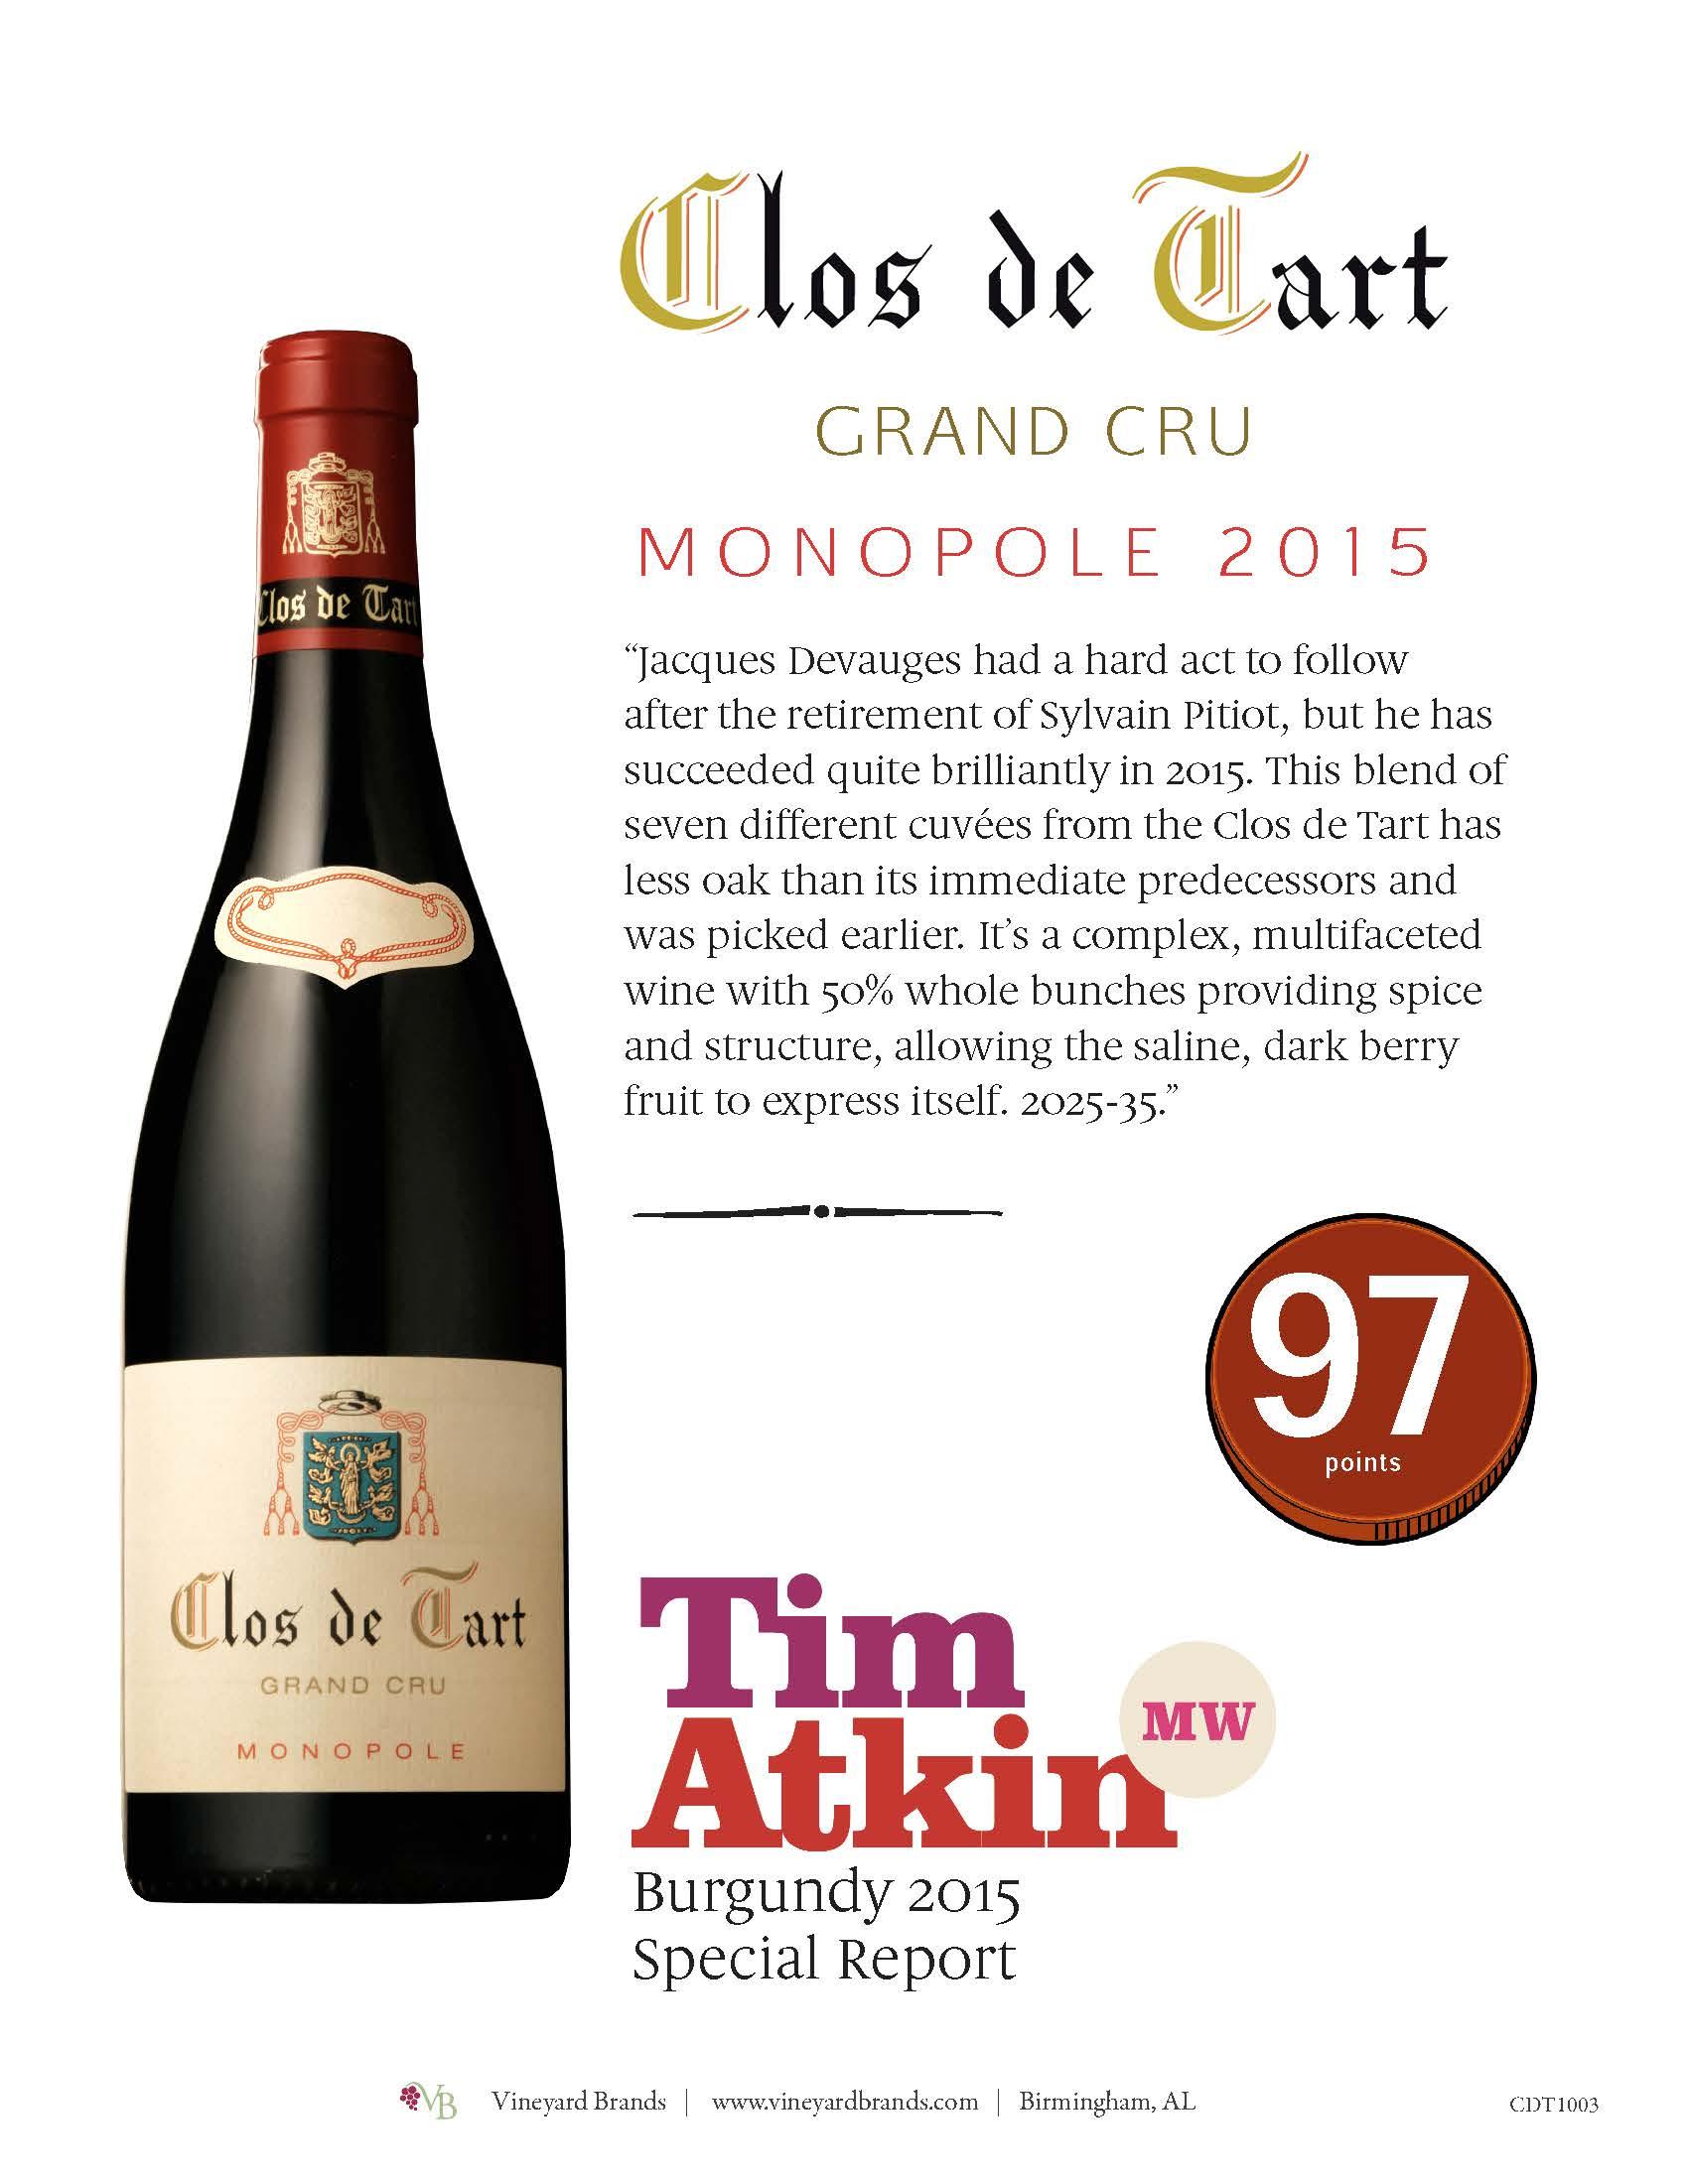 Clos de Tart Monopole 2015.jpg